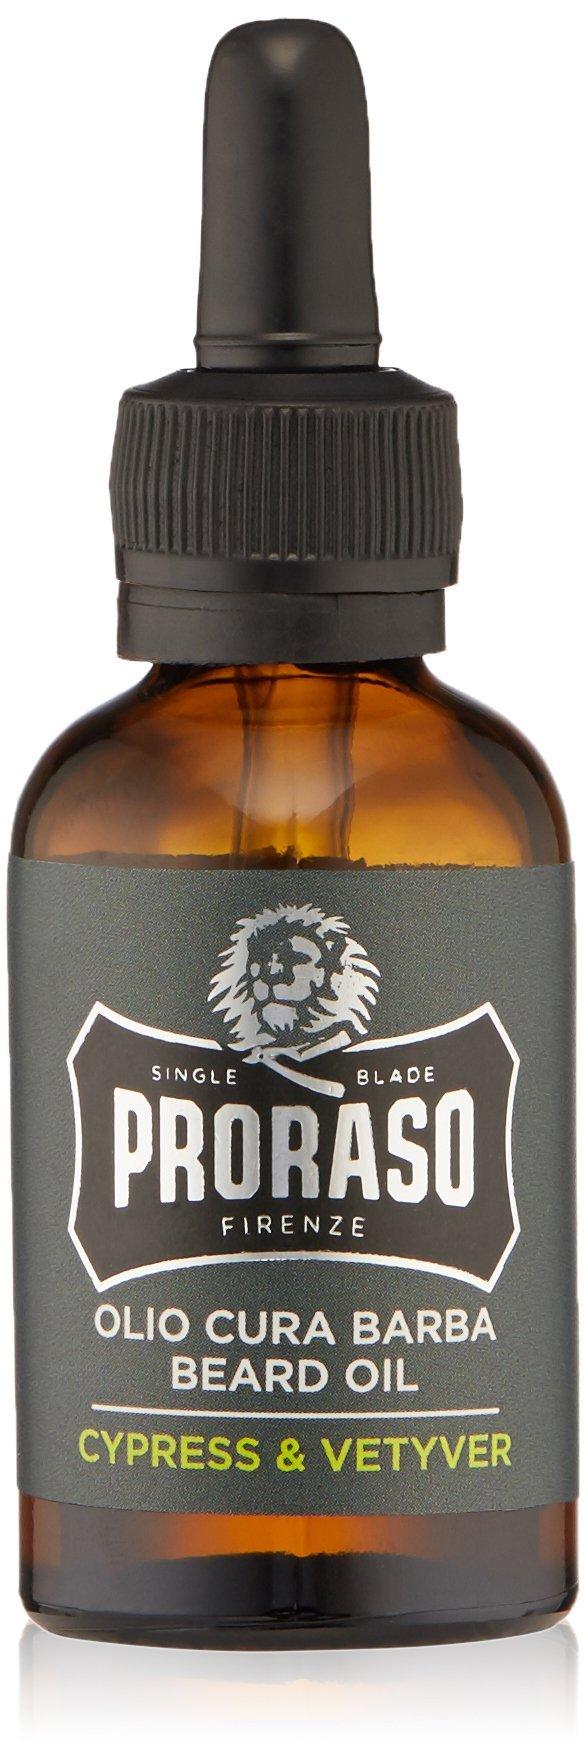 Proraso Beard Oil, Cypress and Vetyver, 1.0 fl oz